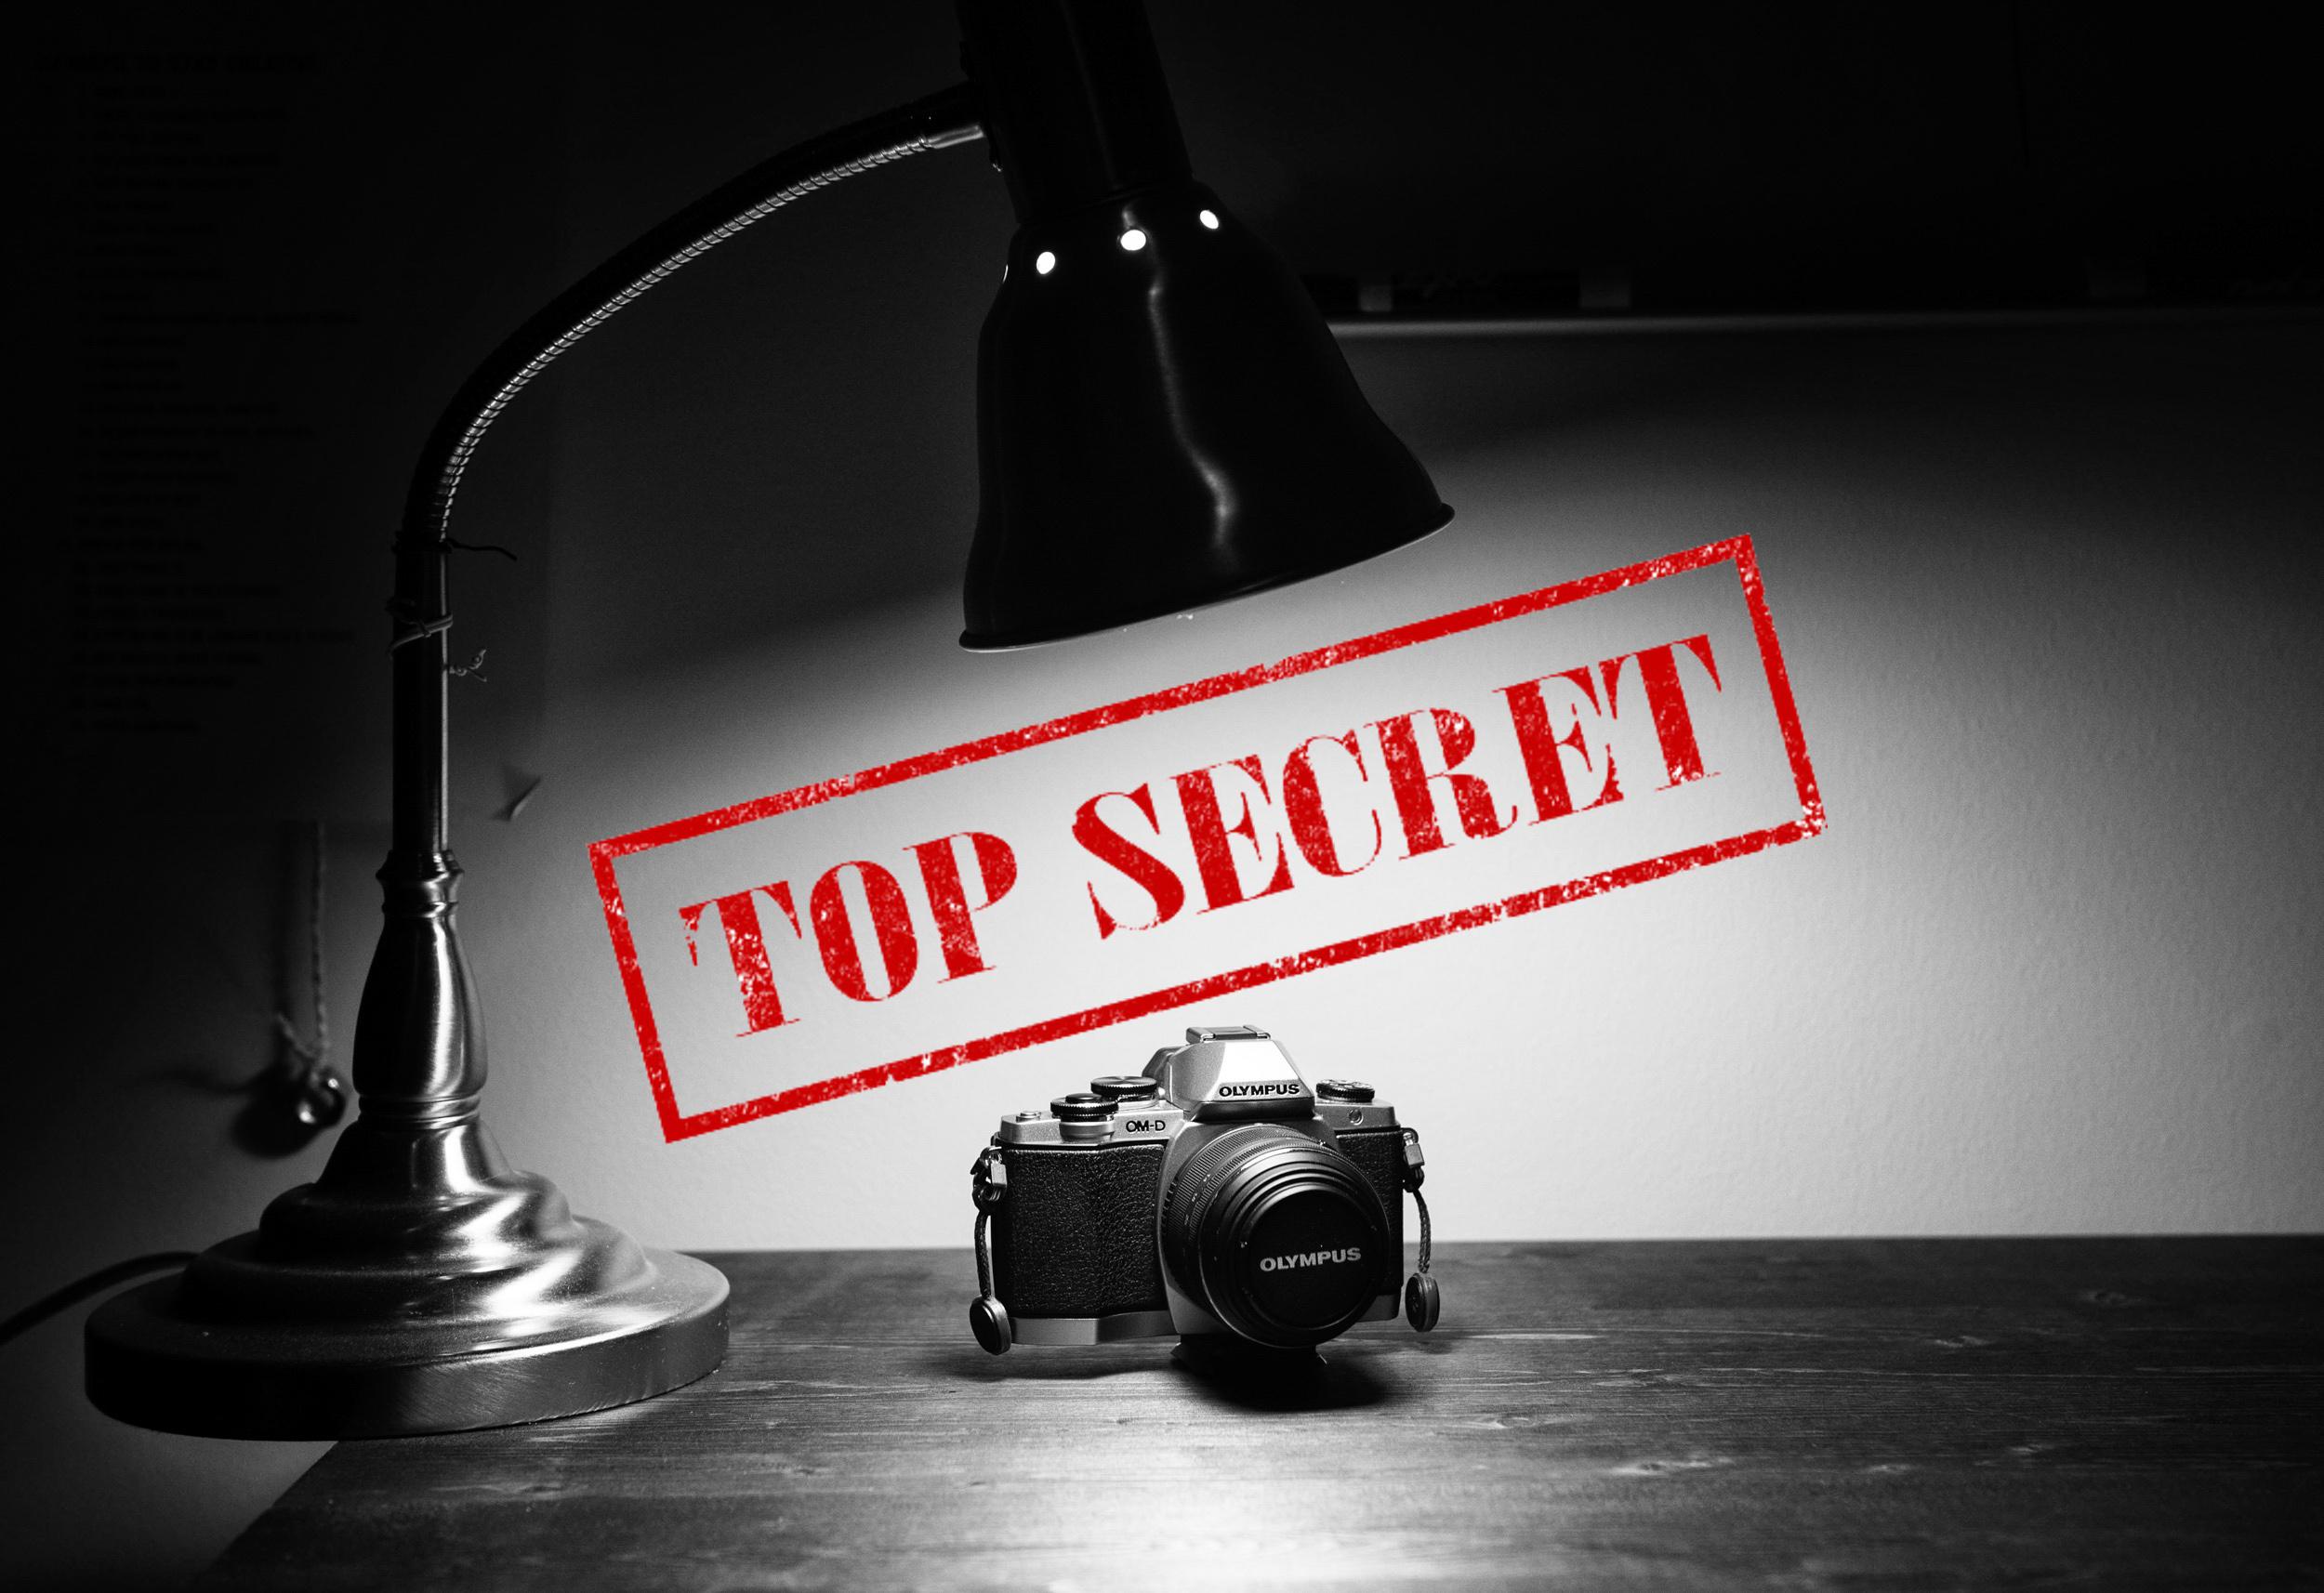 Olympus Cameras have a secret